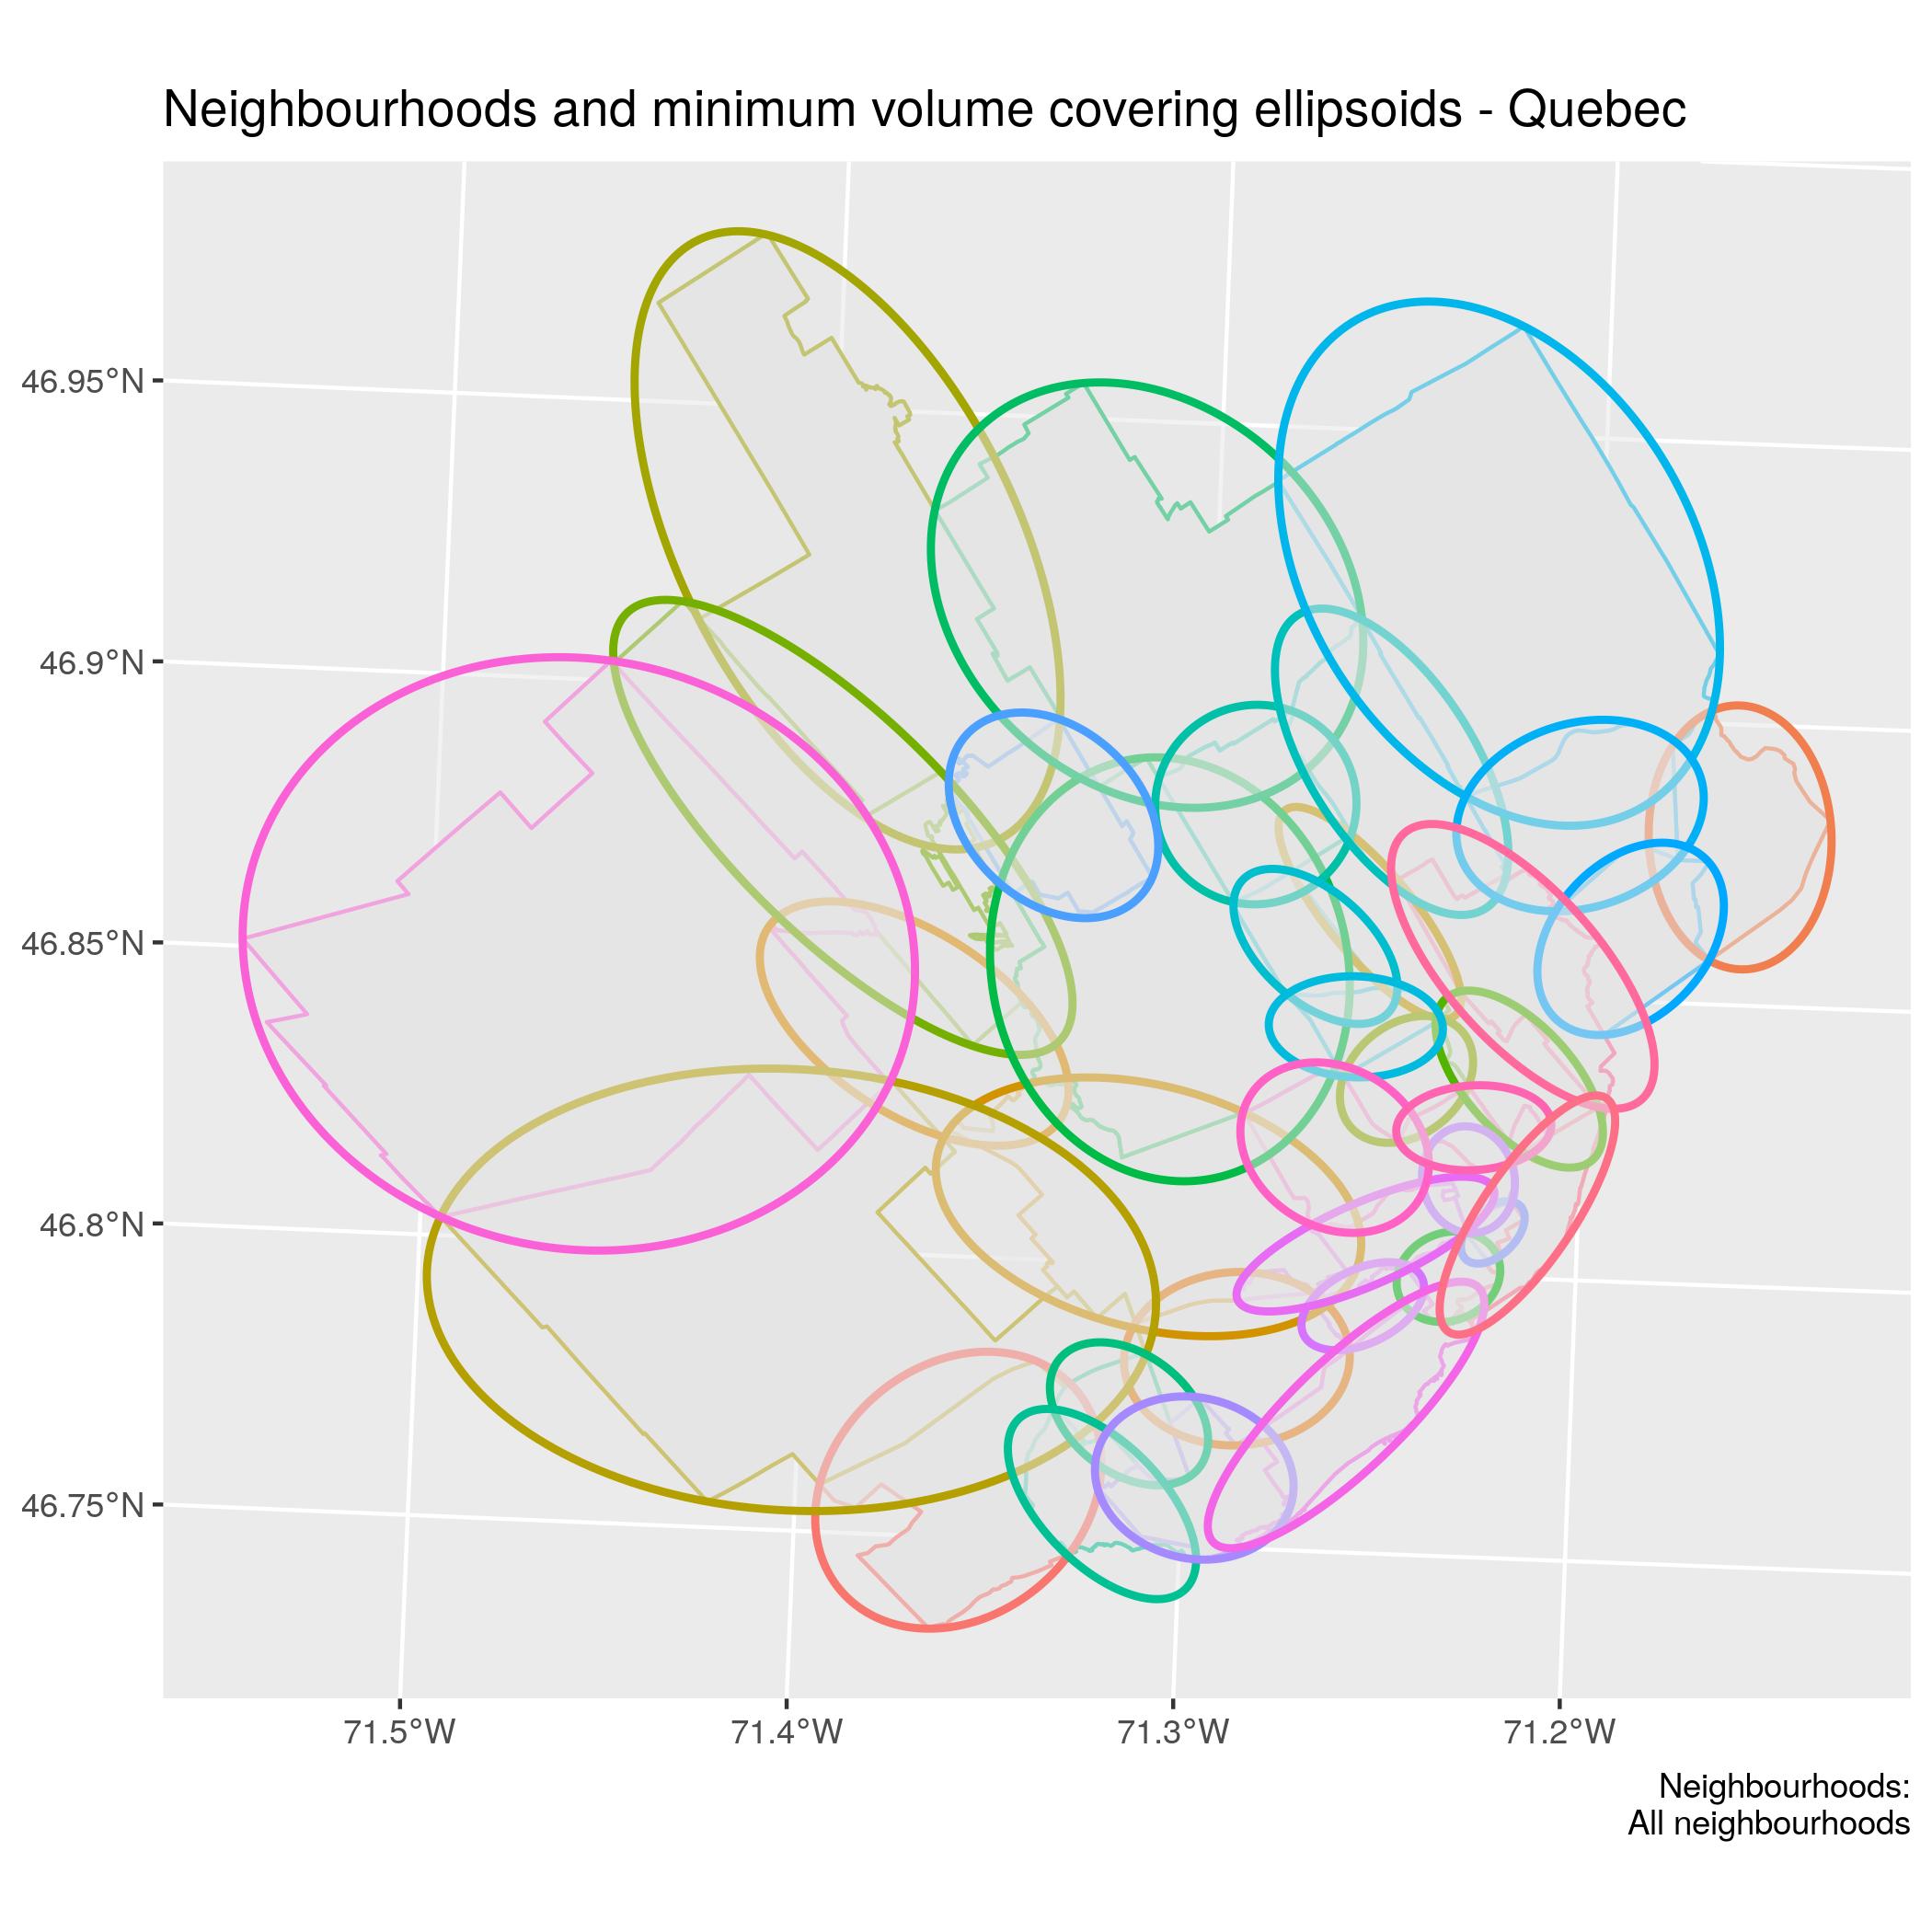 Quebec city neighbourhoods and minimum volume covering ellipsoids